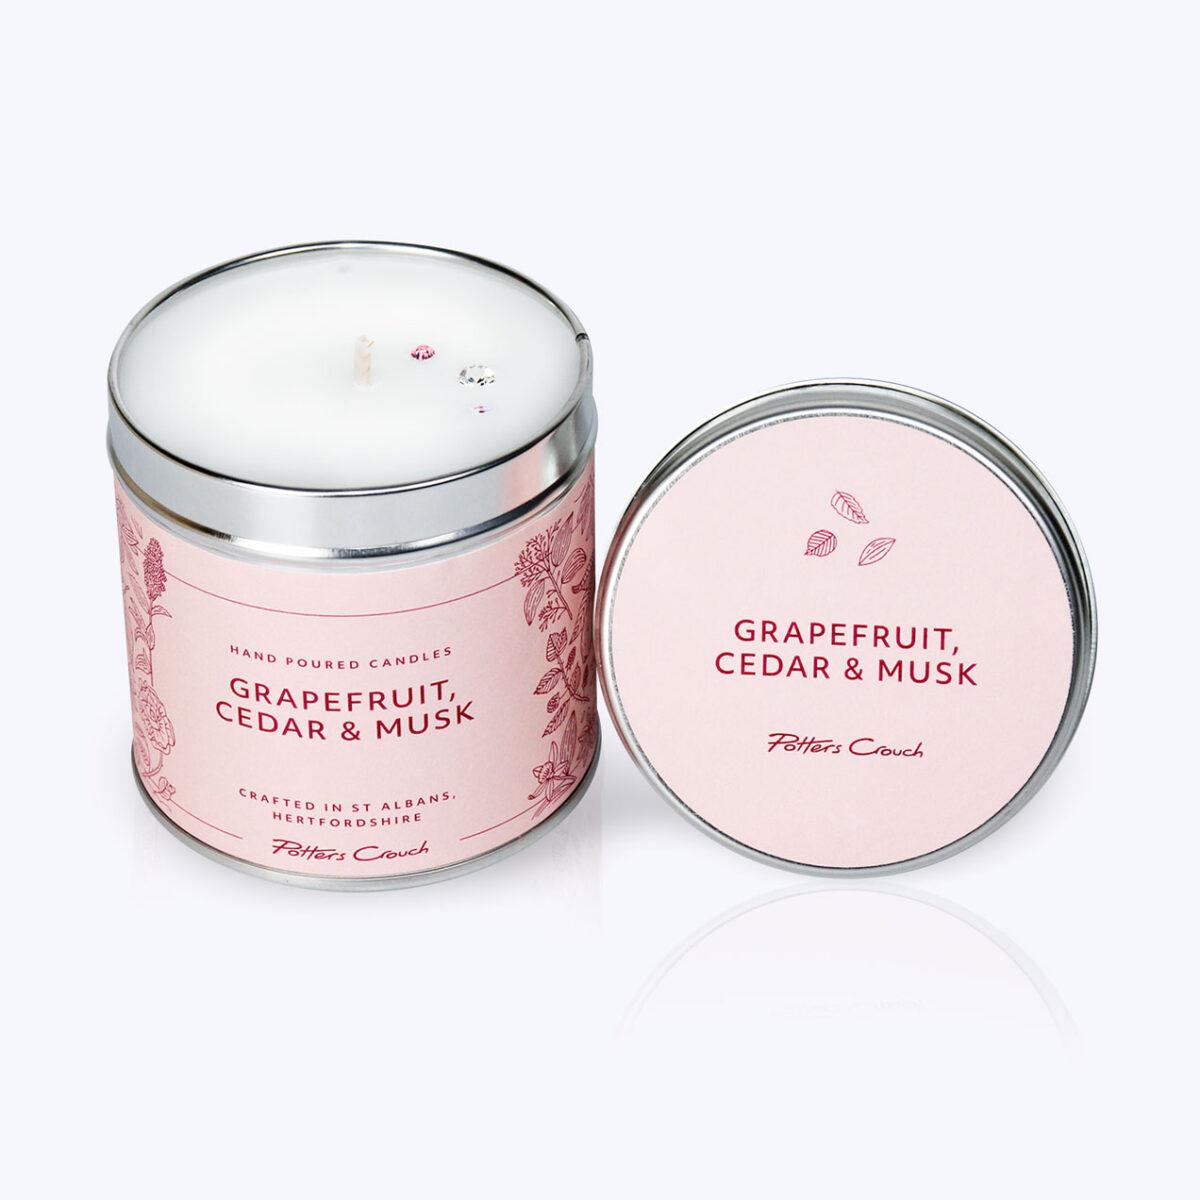 Grapefruit, Cedar & Musk Wellness Candle - For Vitality